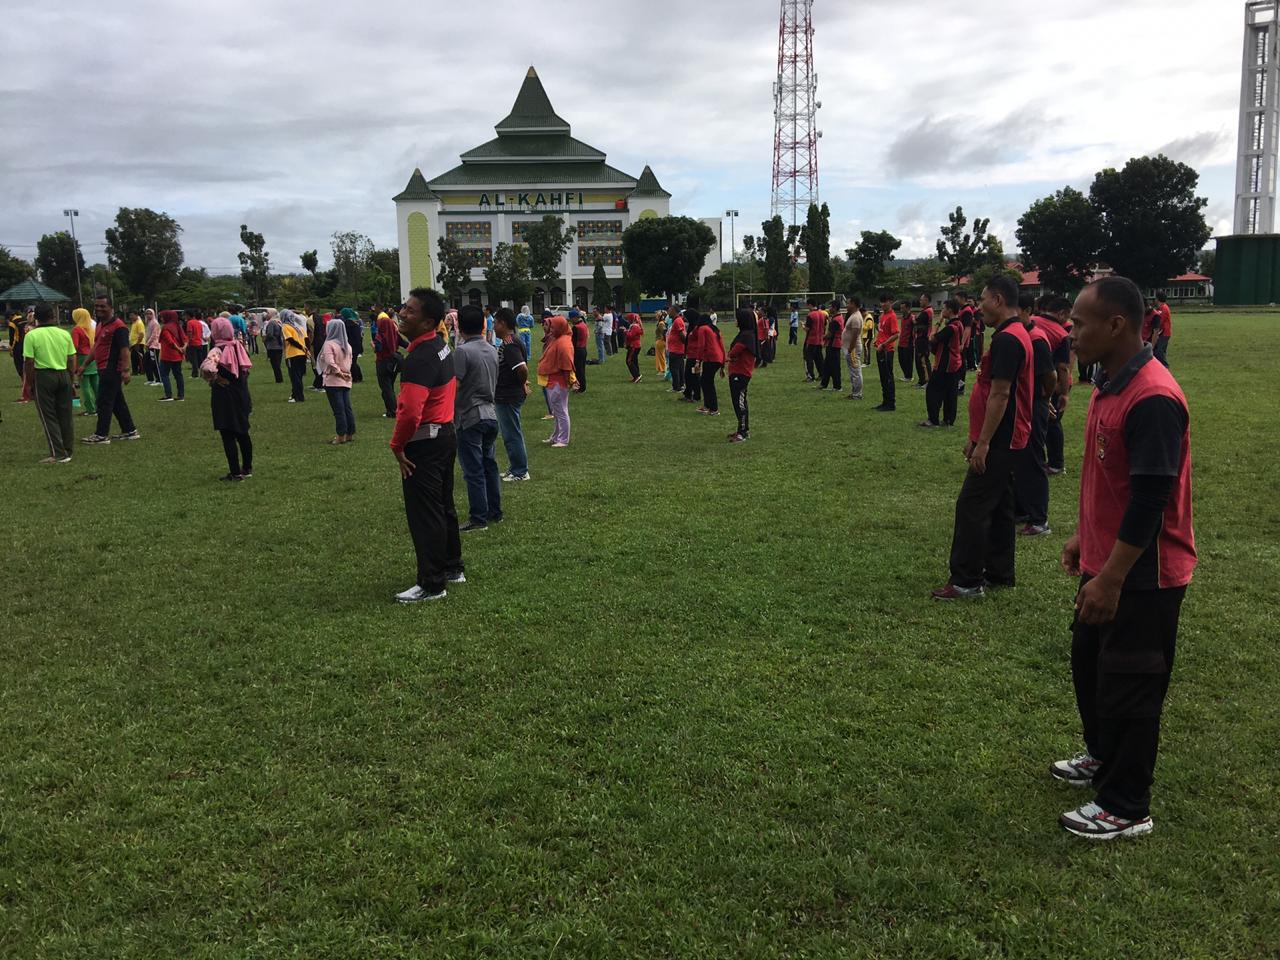 Olahraga Bersama di Kaur, Dinas Pariwisata Provinsi Bengkulu Kenalkan Senam Bekatak Kurak-Karik